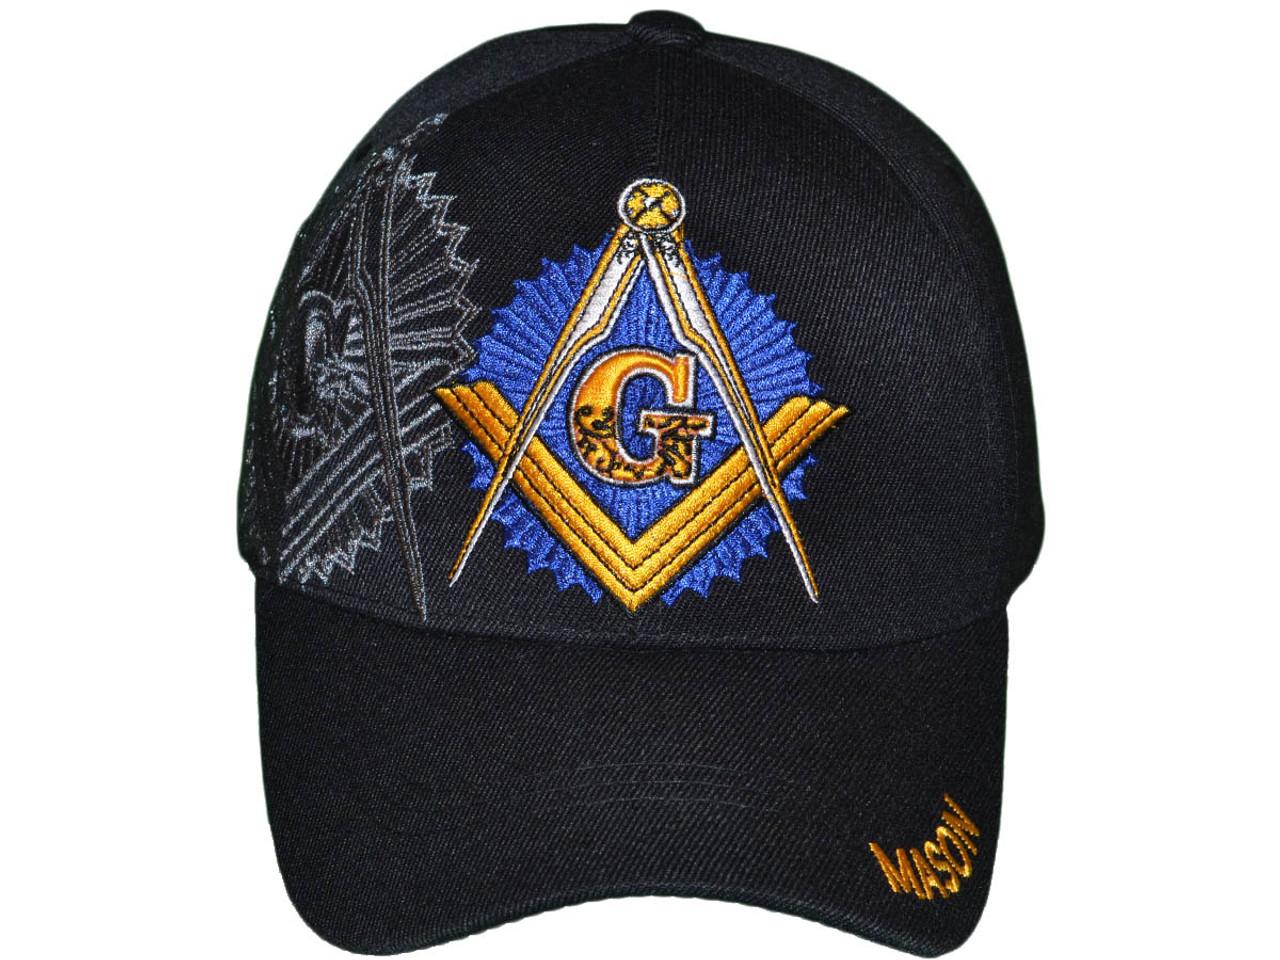 Masonic Baseball Hats BK Caps Wholesale 3D Embroidered